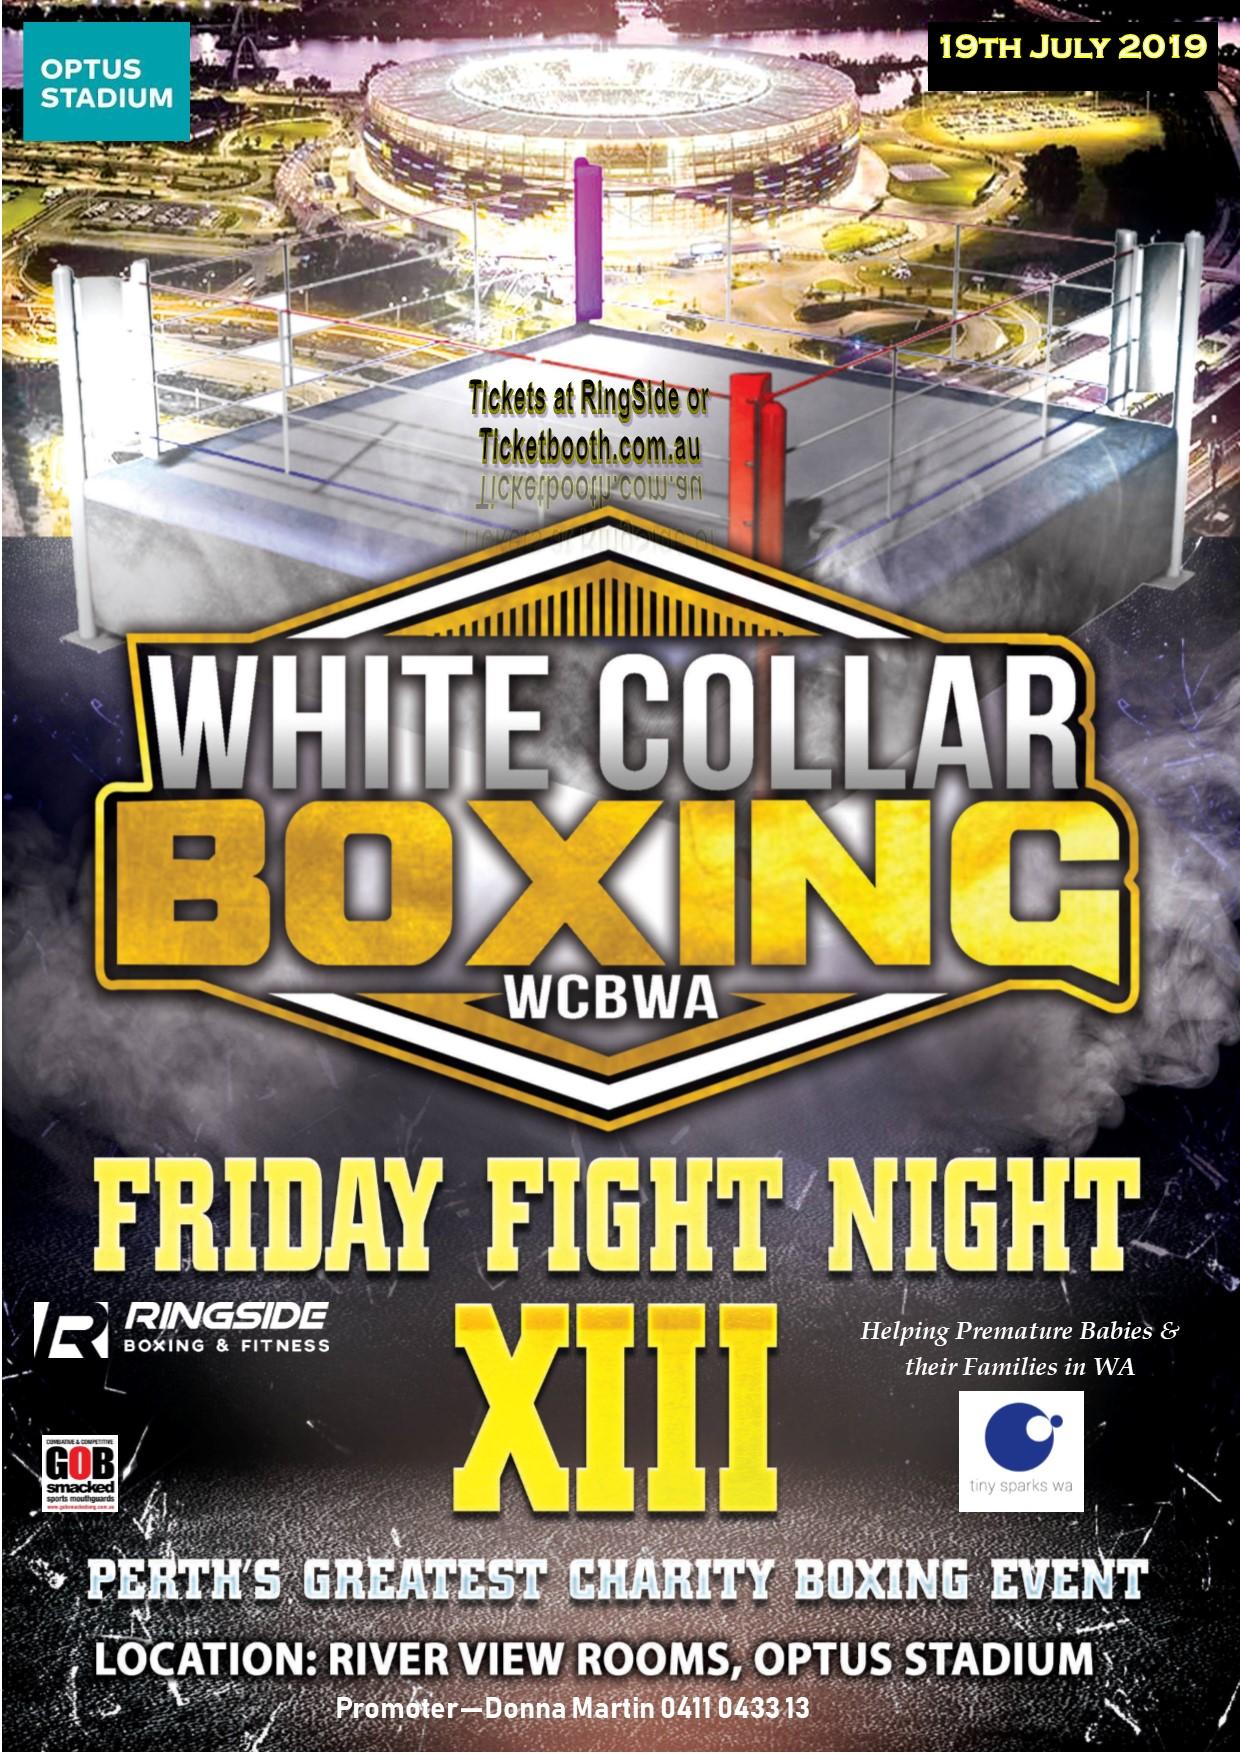 White Collar Boxing WA charity event #13